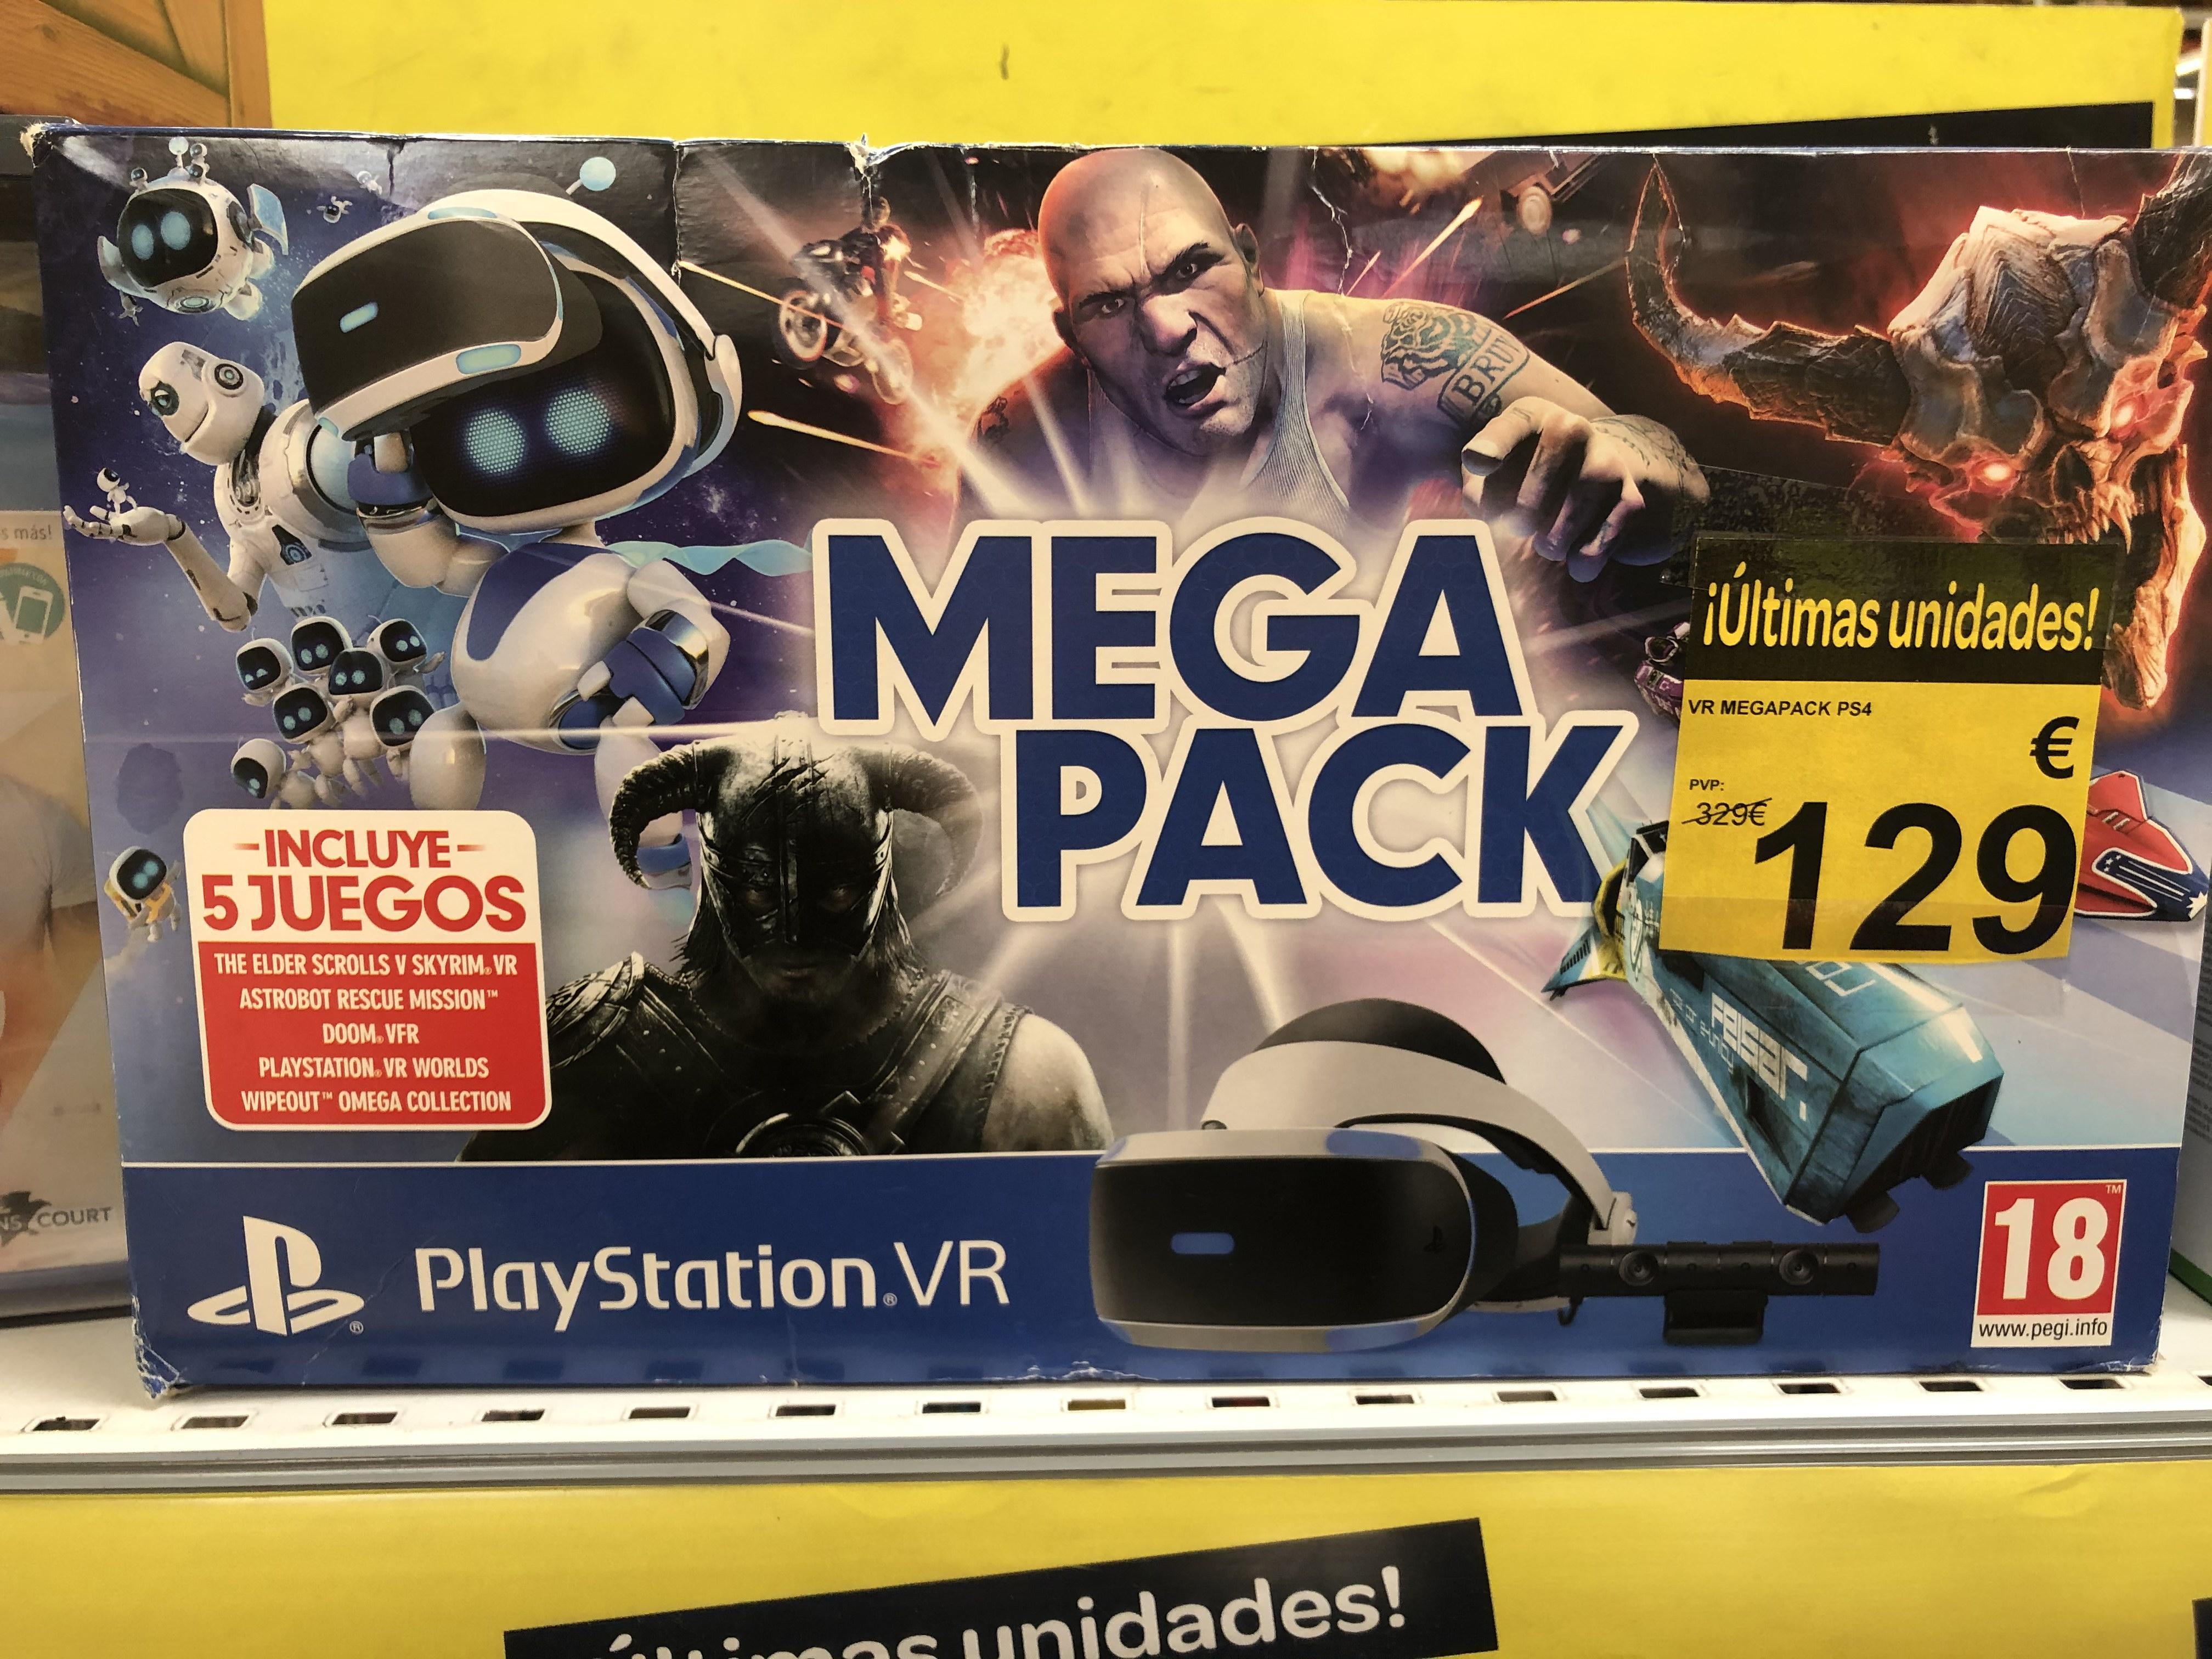 PlayStation VR Mega Pack - PlayStation 4